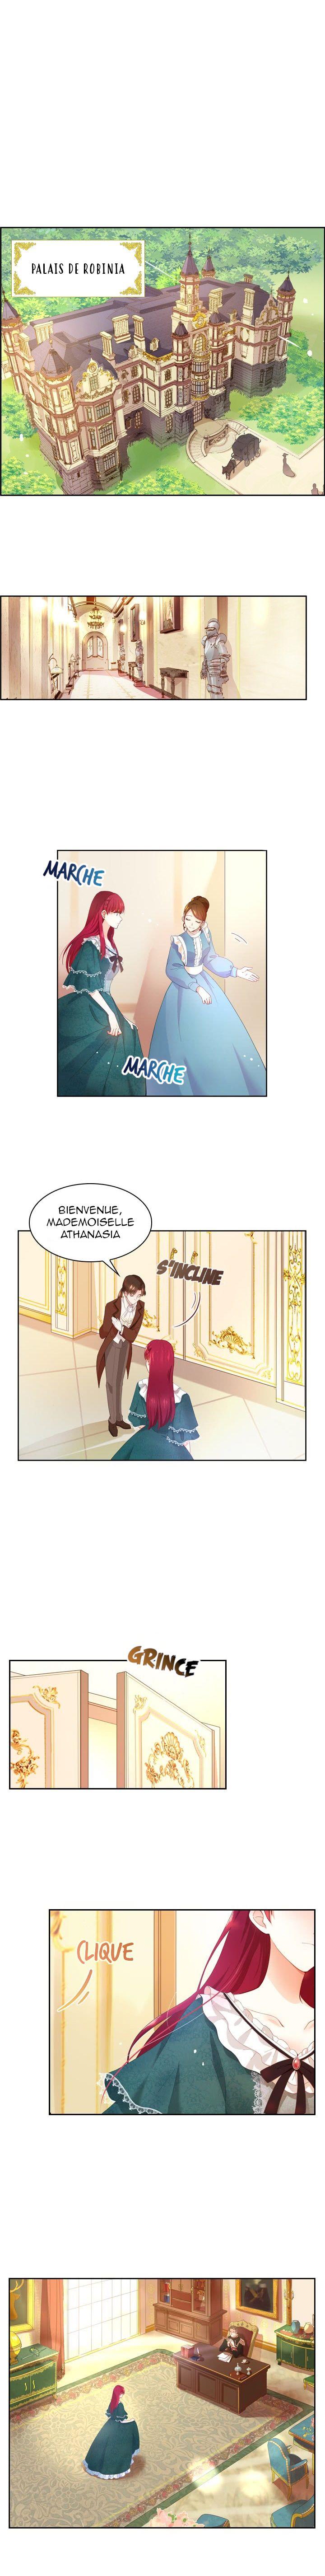 https://nine.mangadogs.com/fr_manga/pic2/3/8643/427410/TheEvilLadyWillChangeChapi_4_3.jpg Page 5